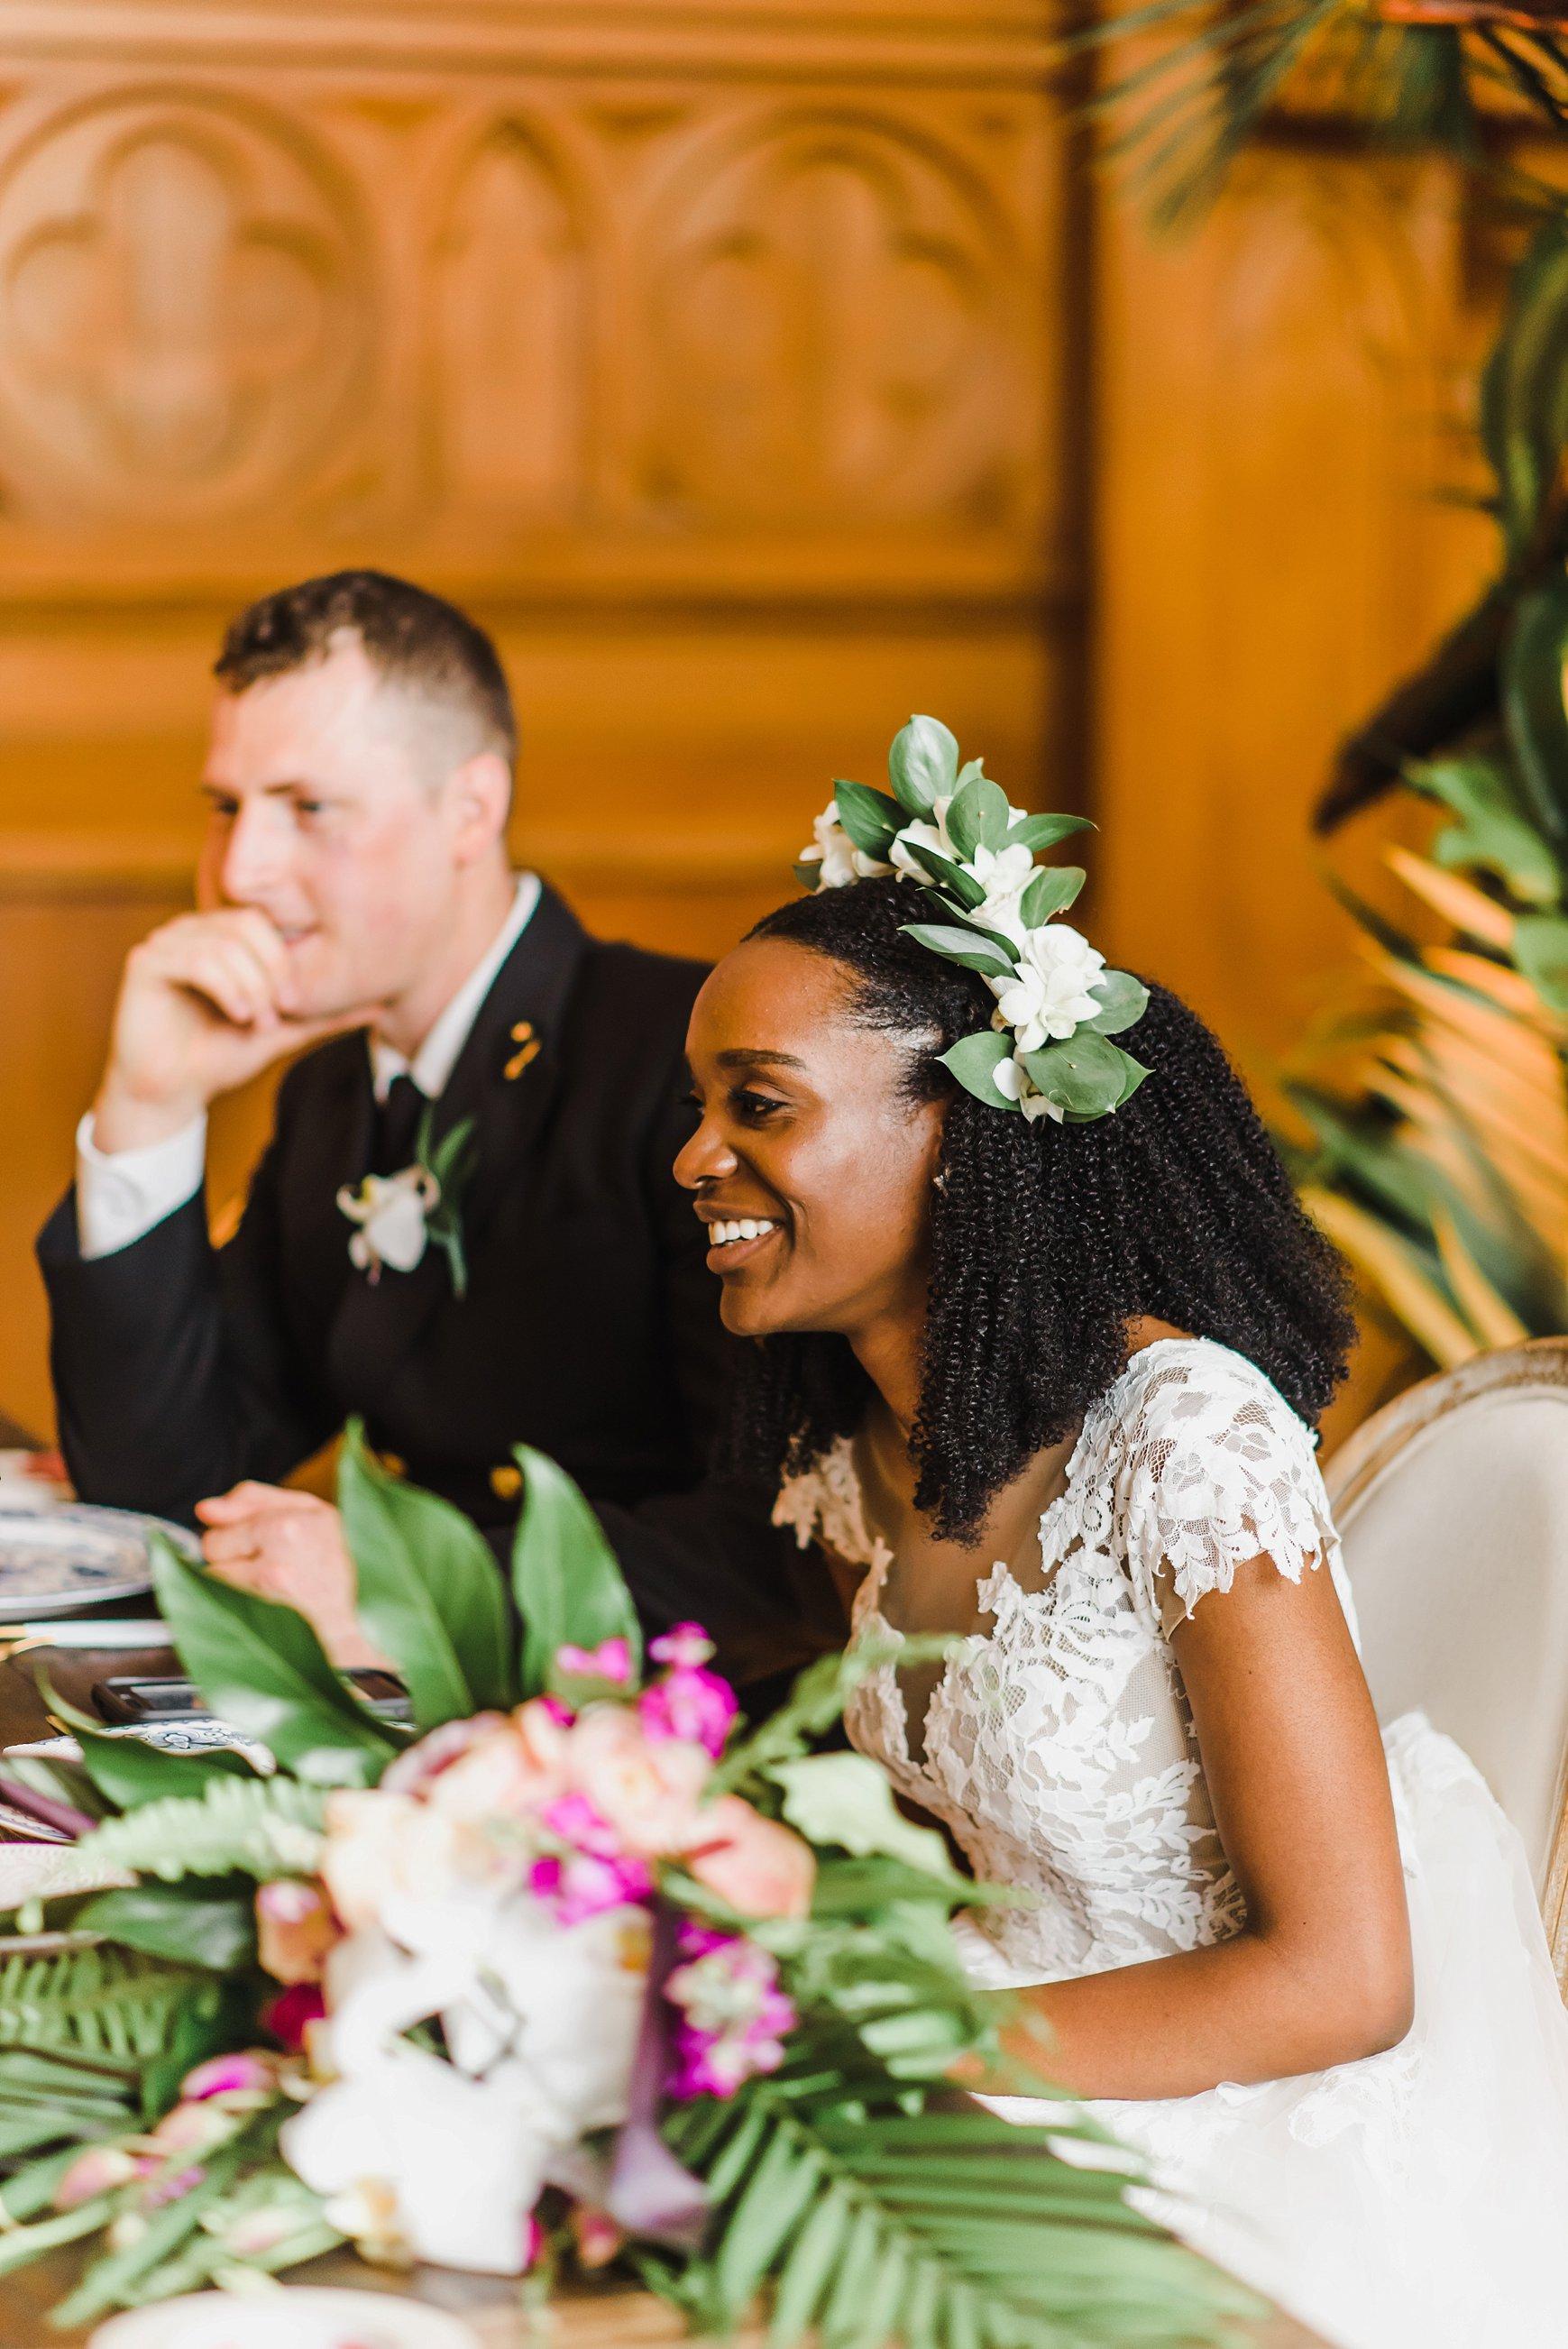 light airy indie fine art ottawa wedding photographer | Ali and Batoul Photography_1041.jpg